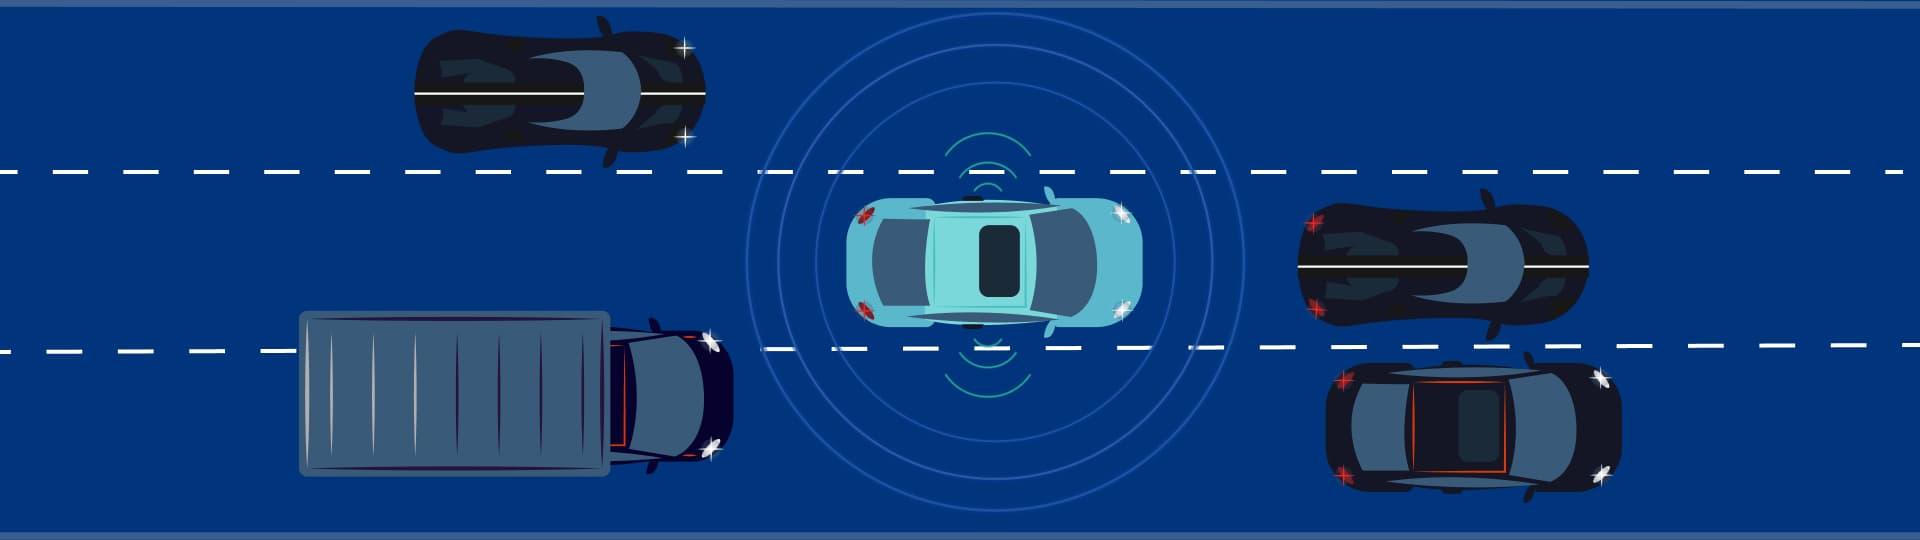 система мониторинга транспорта и контроля топлива?